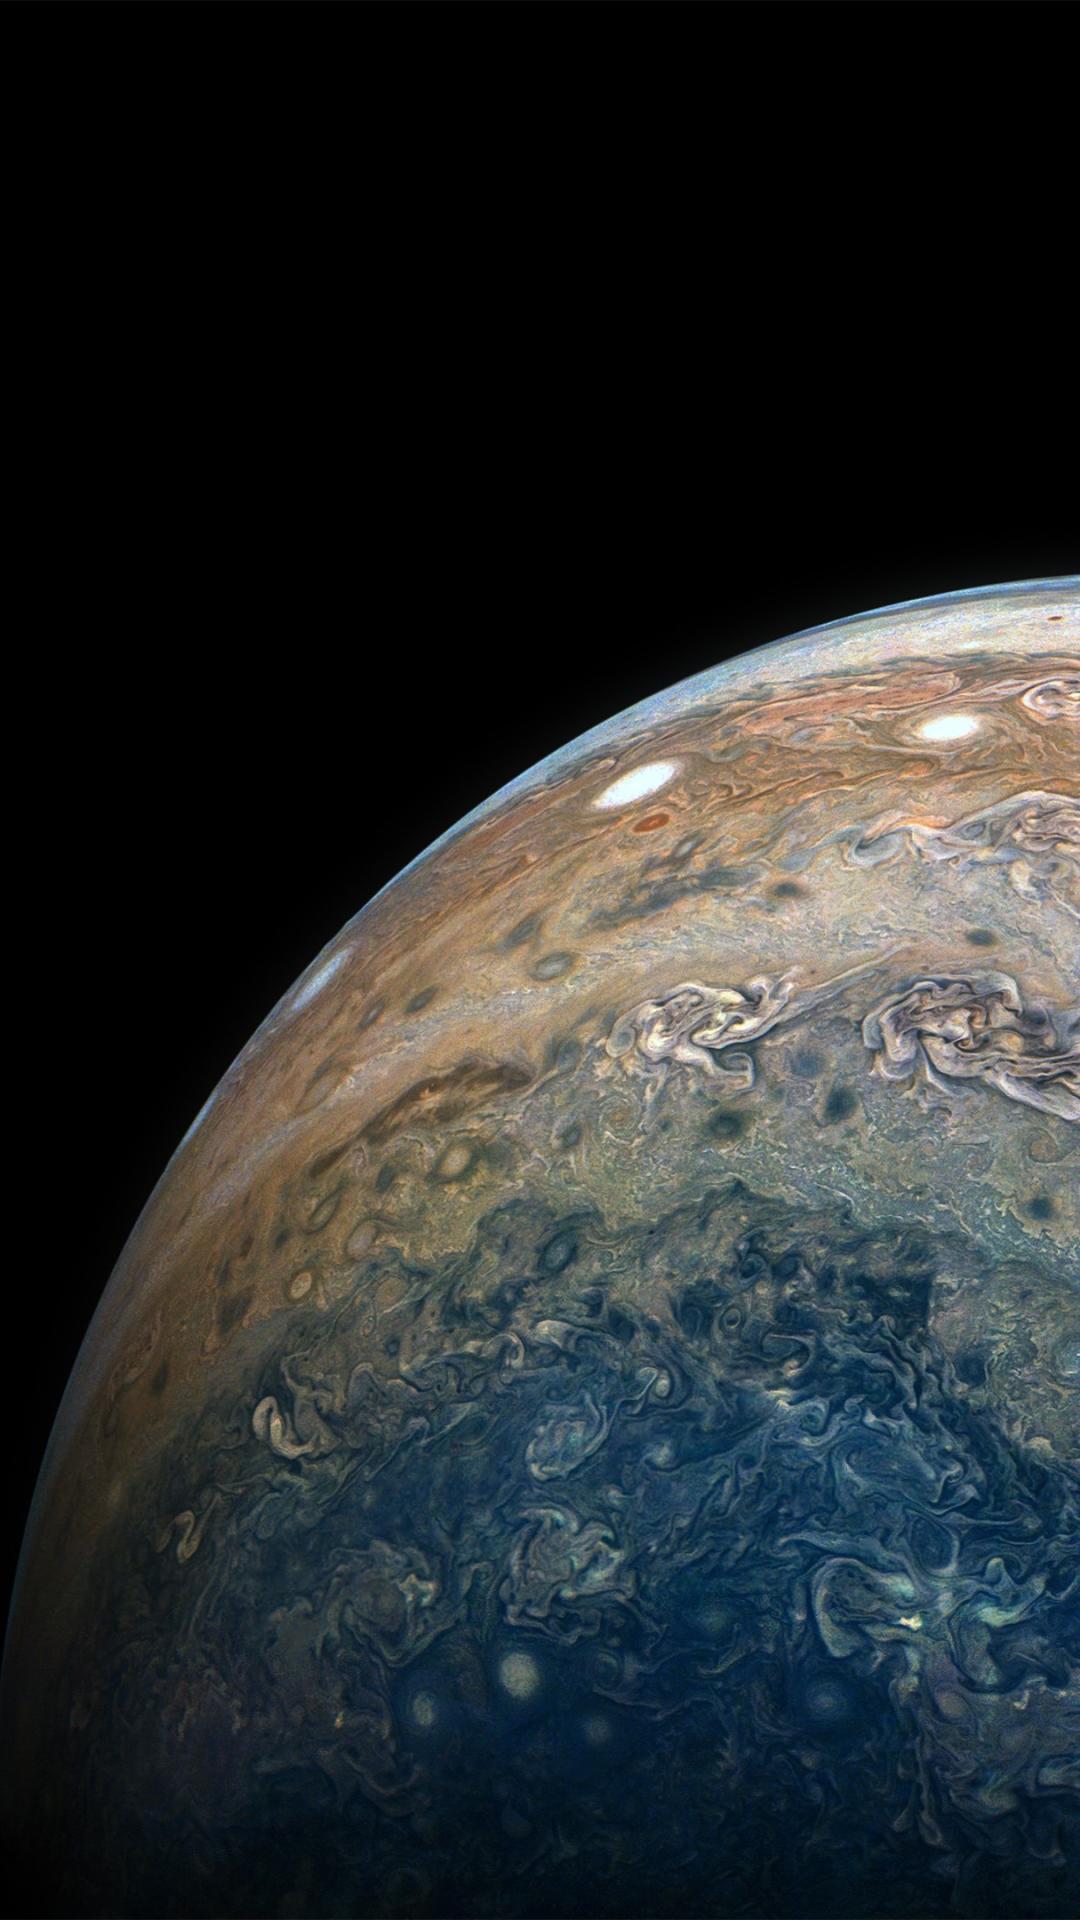 Sci Fi Jupiter 1080x1920 Wallpaper Id 749762 Mobile Abyss